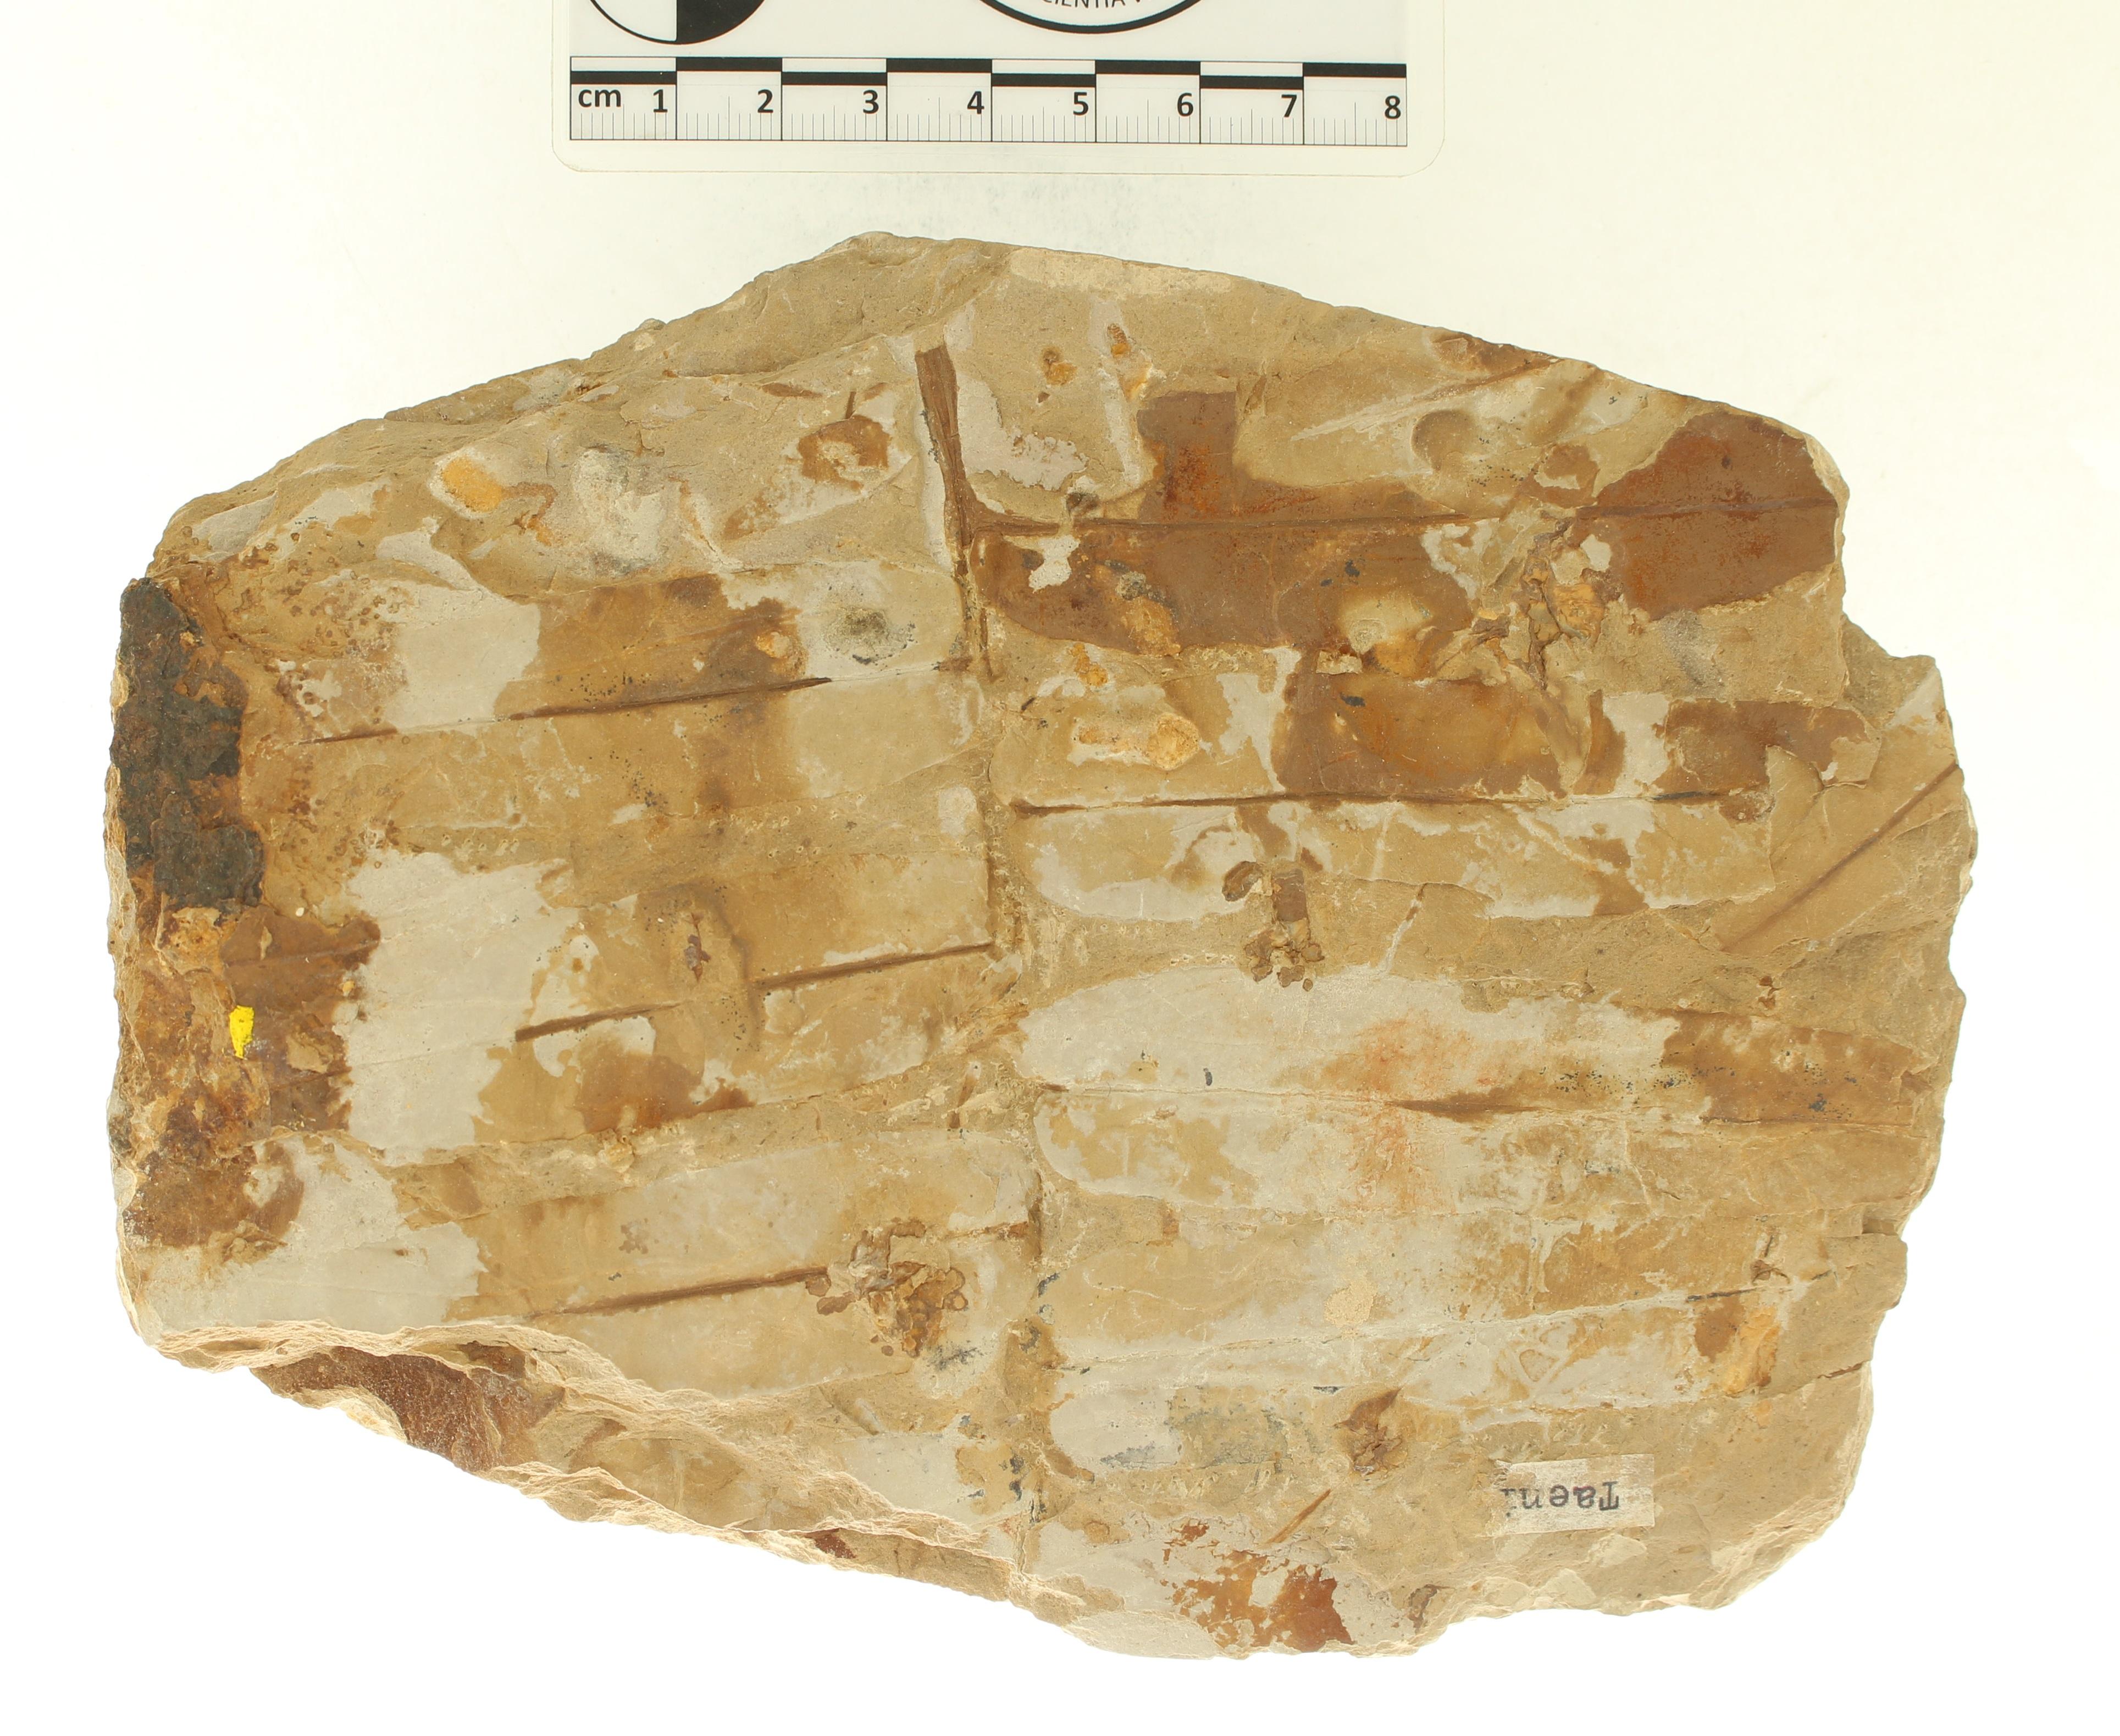 IRSNB b 8656 - Detail